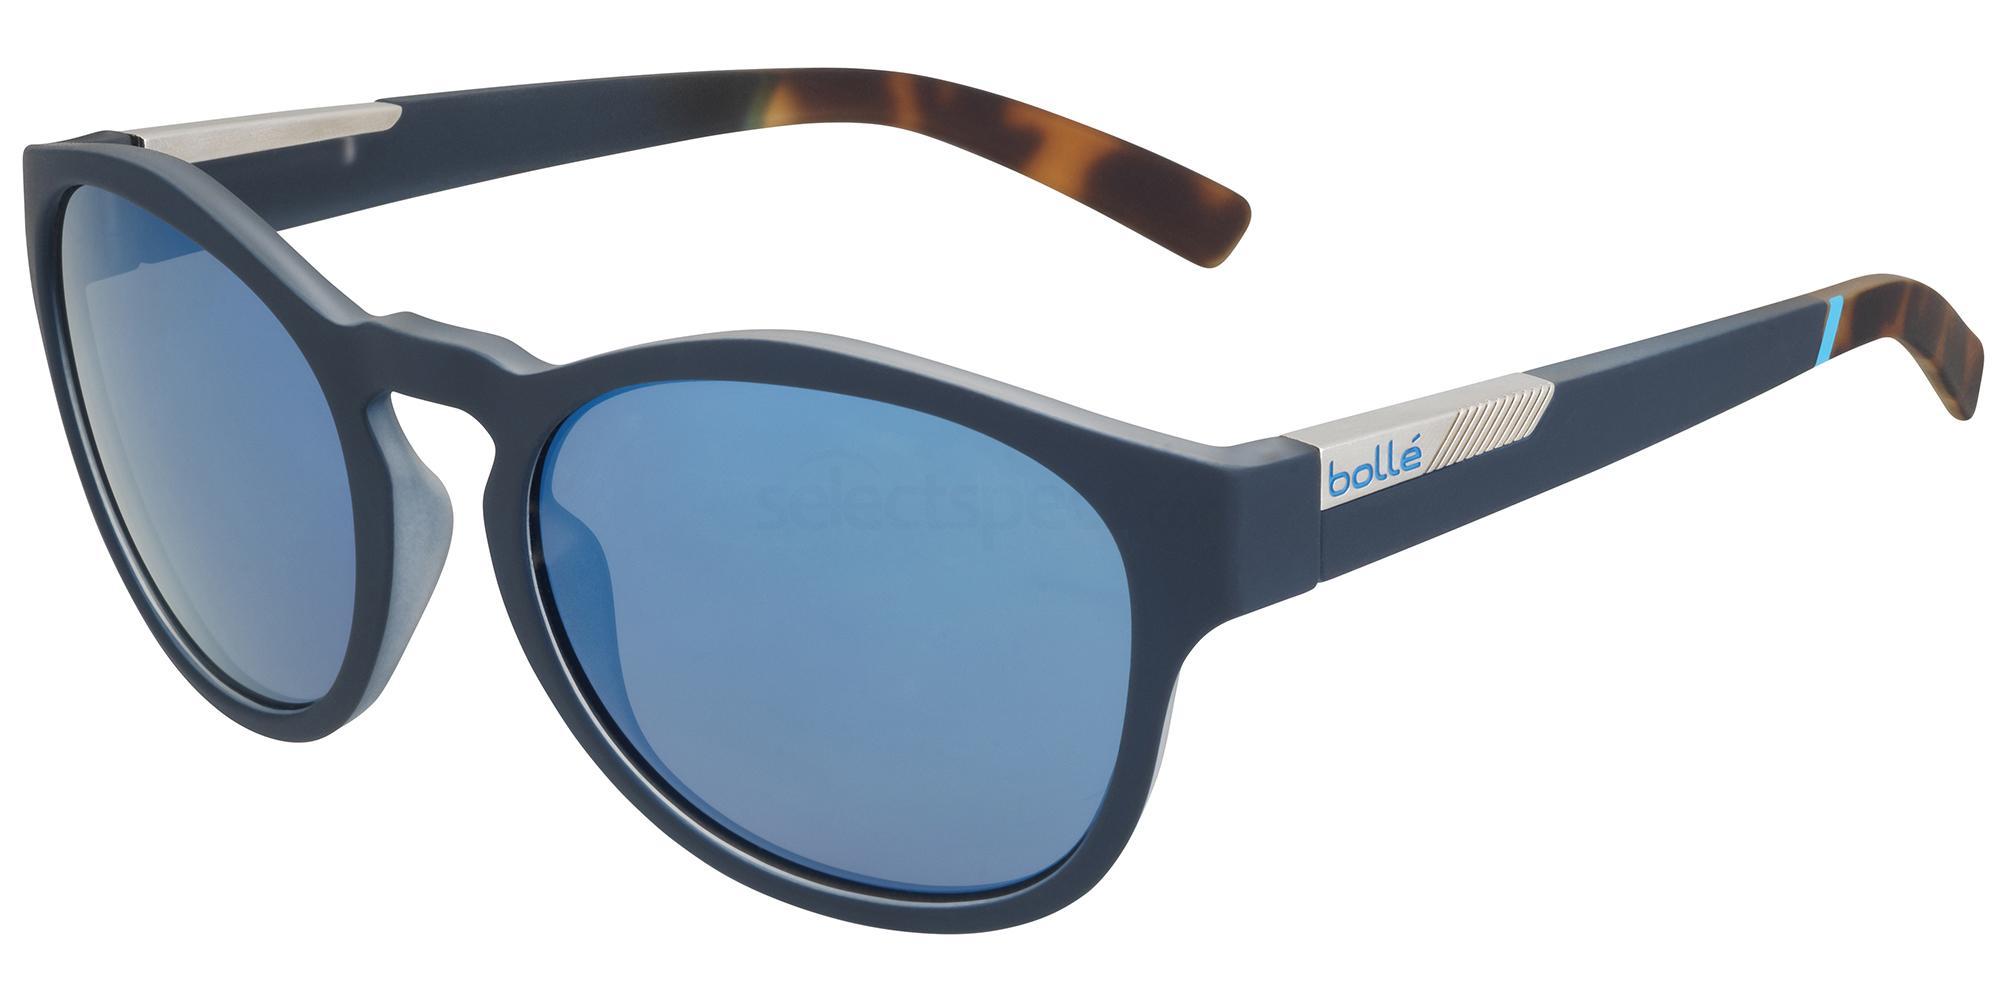 12349 Rooke Sunglasses, Bolle